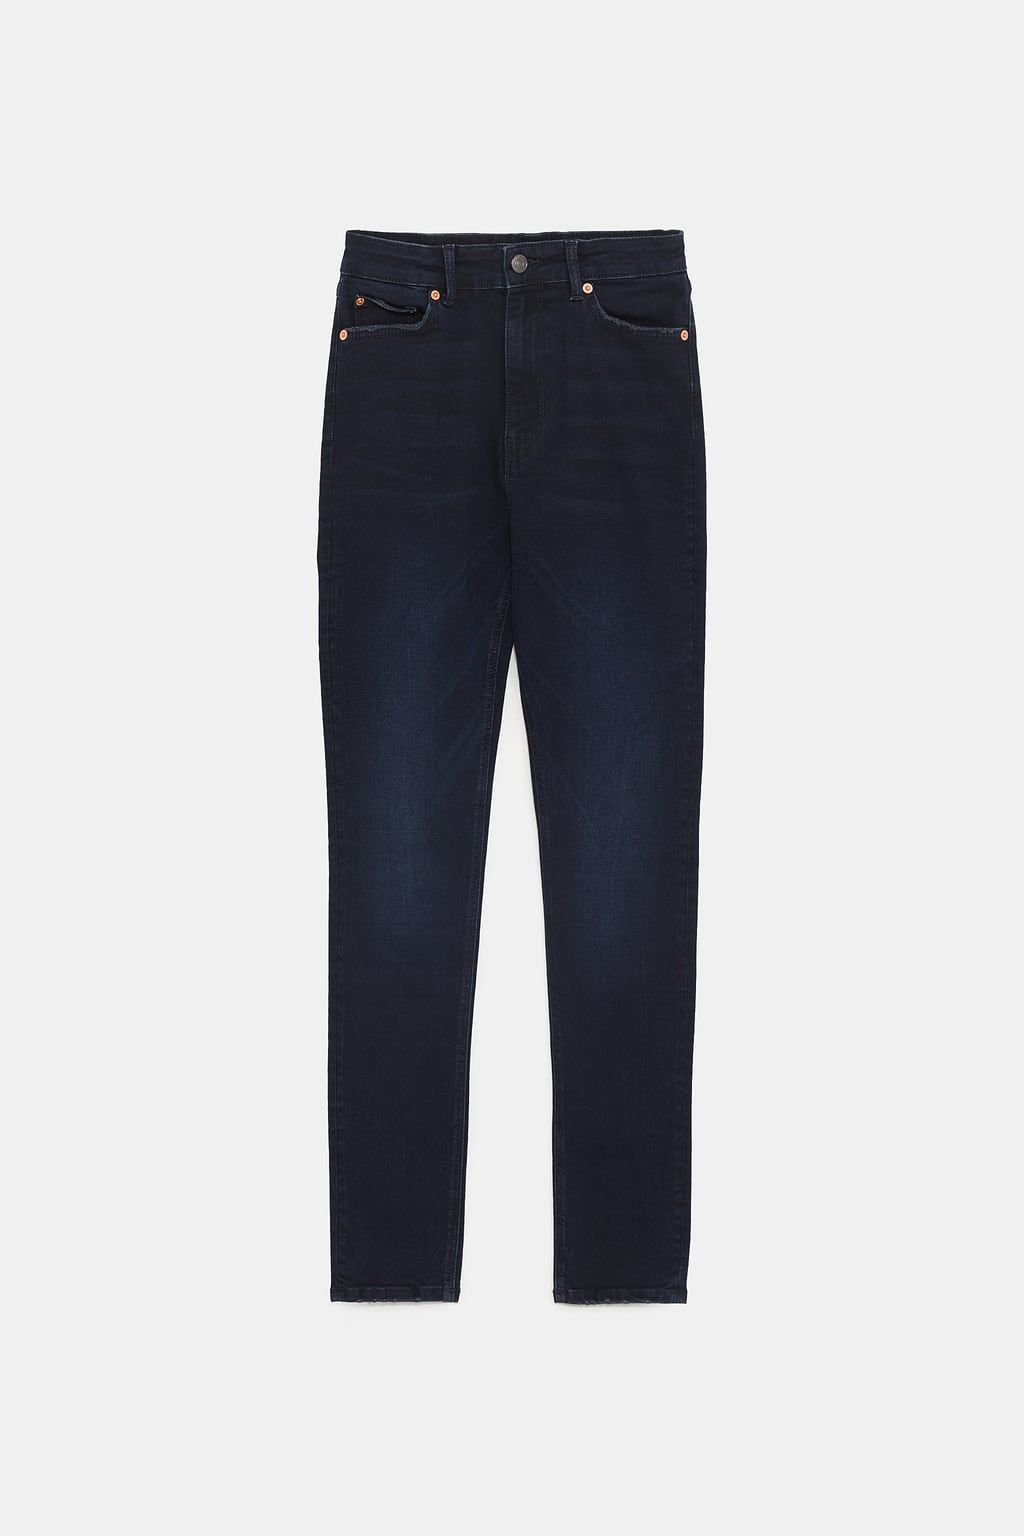 4f990c2c Blue black zw premium high waist skinny jeans in 2019   Beauty voice ...